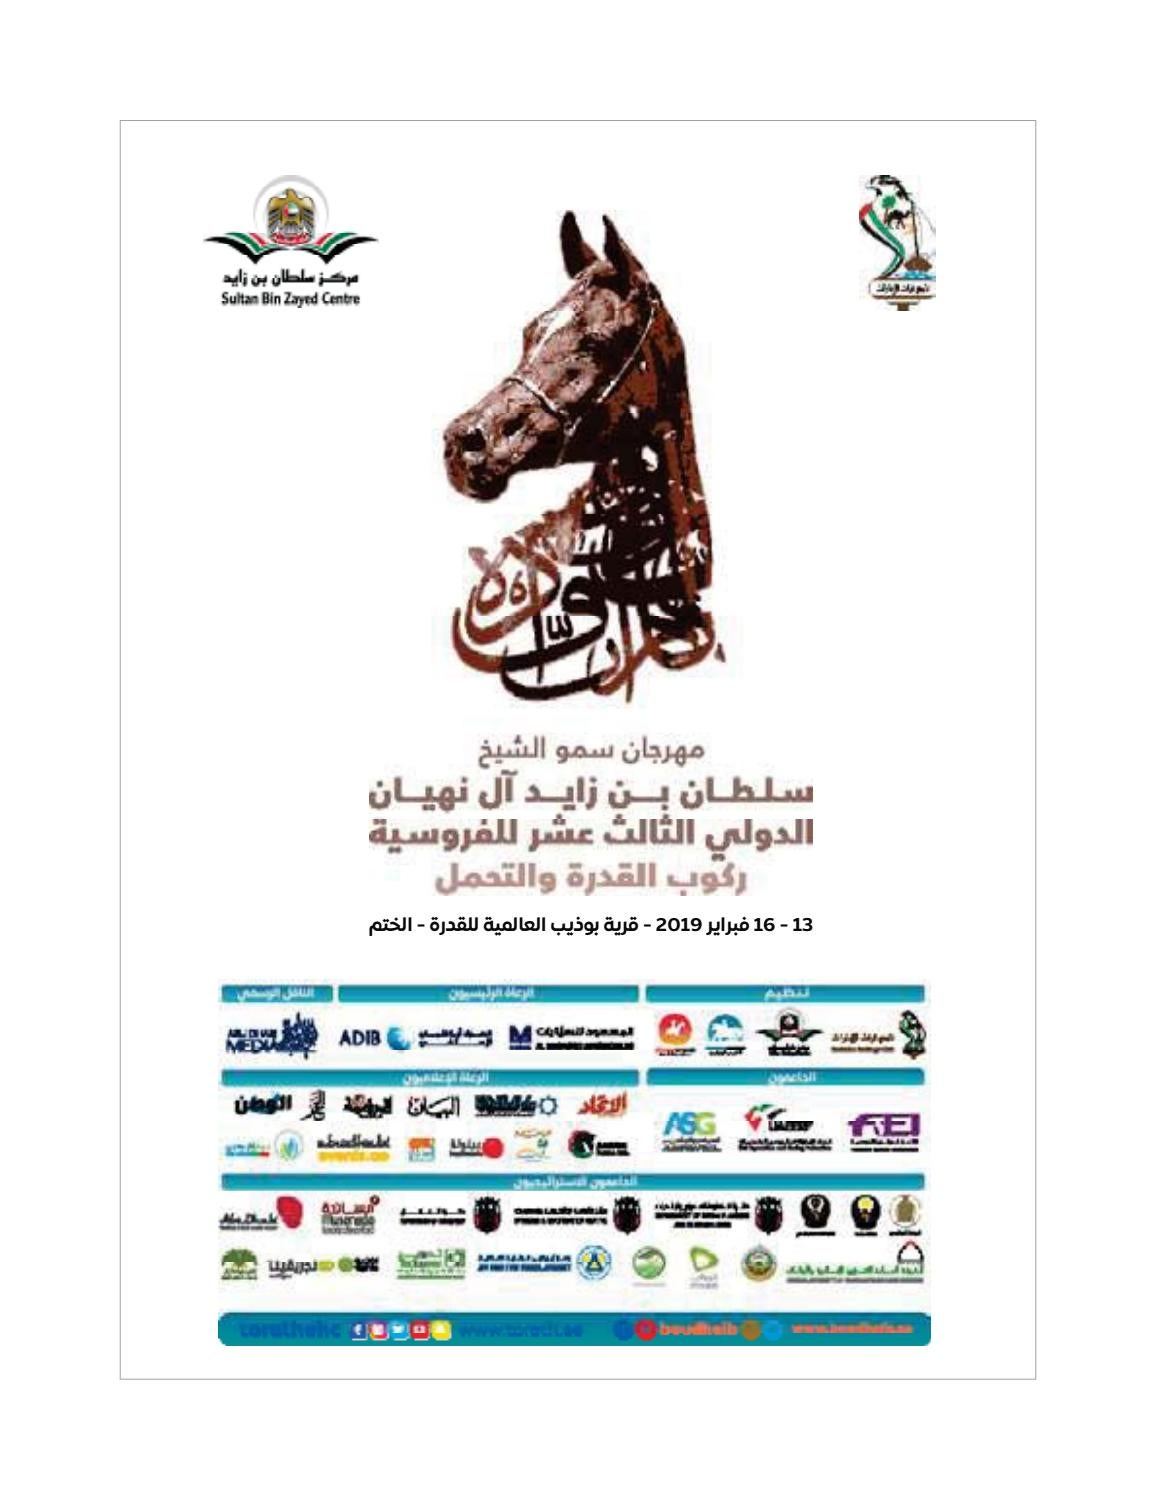 Turath232feb2019 تراث الإمارات فبراير By Sbzc Mags Issuu